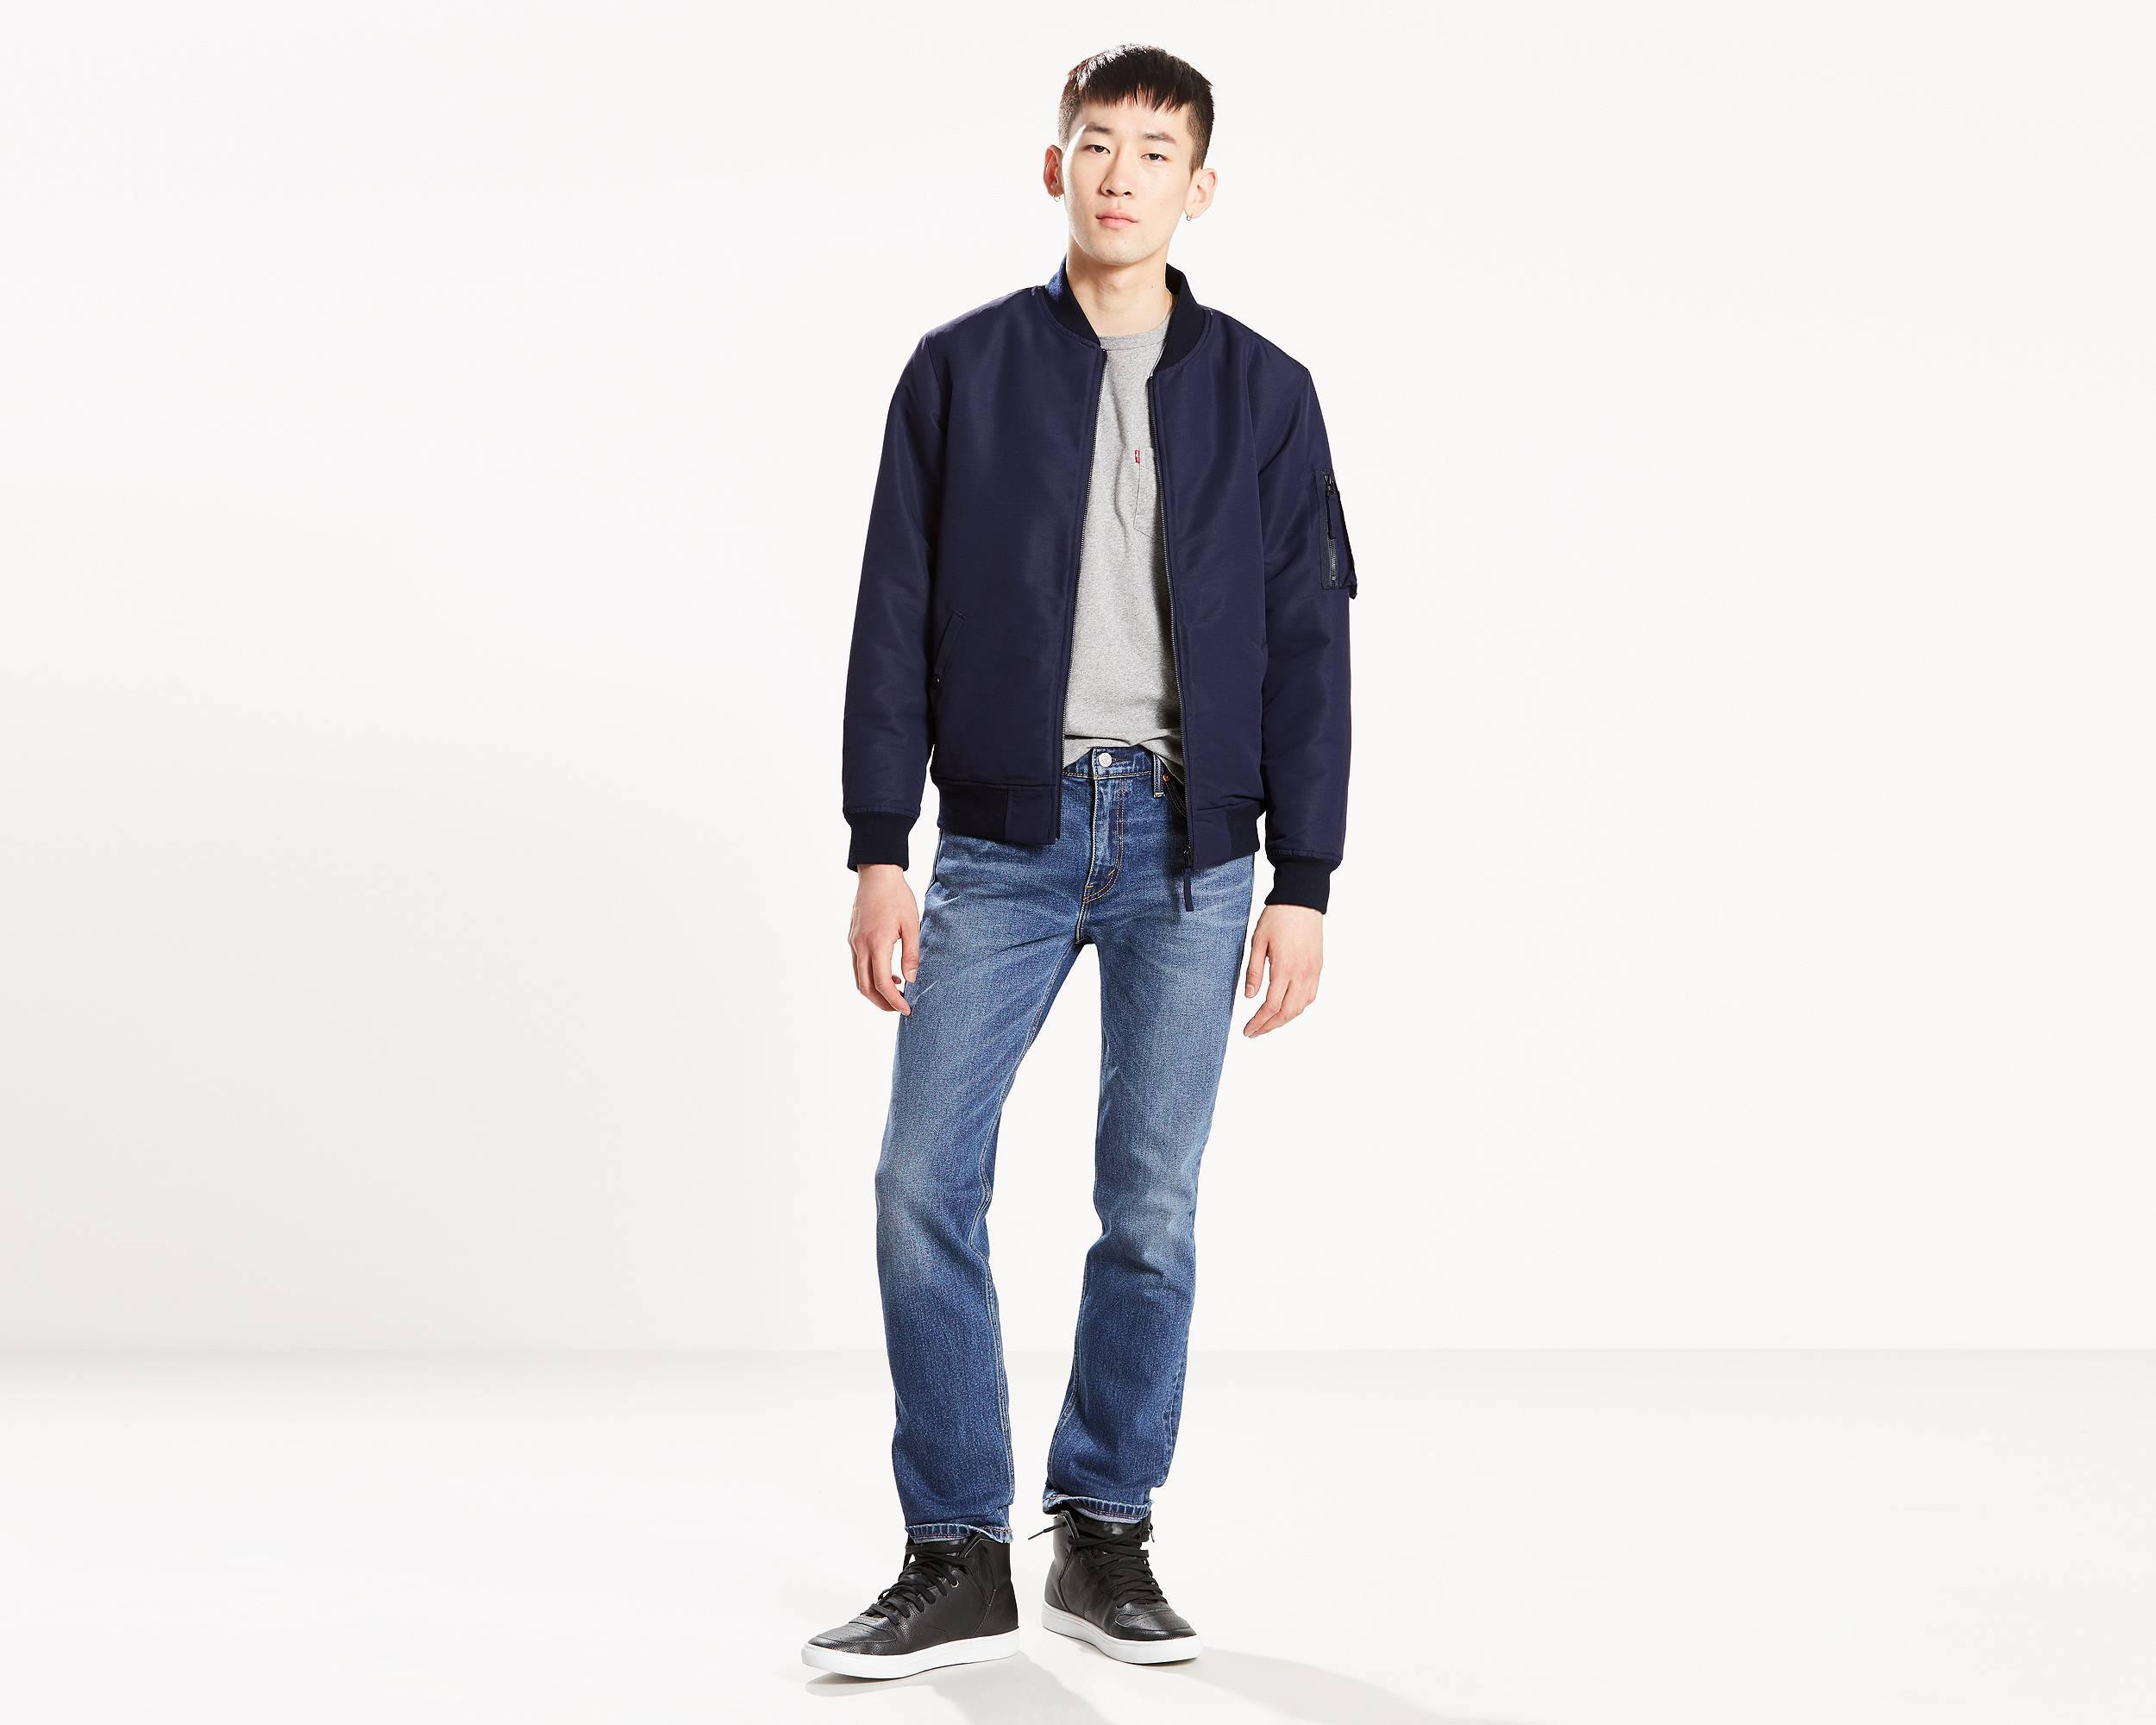 Slim Fit Jeans for Men   Shop 511 Slim Jeans   Levi's®